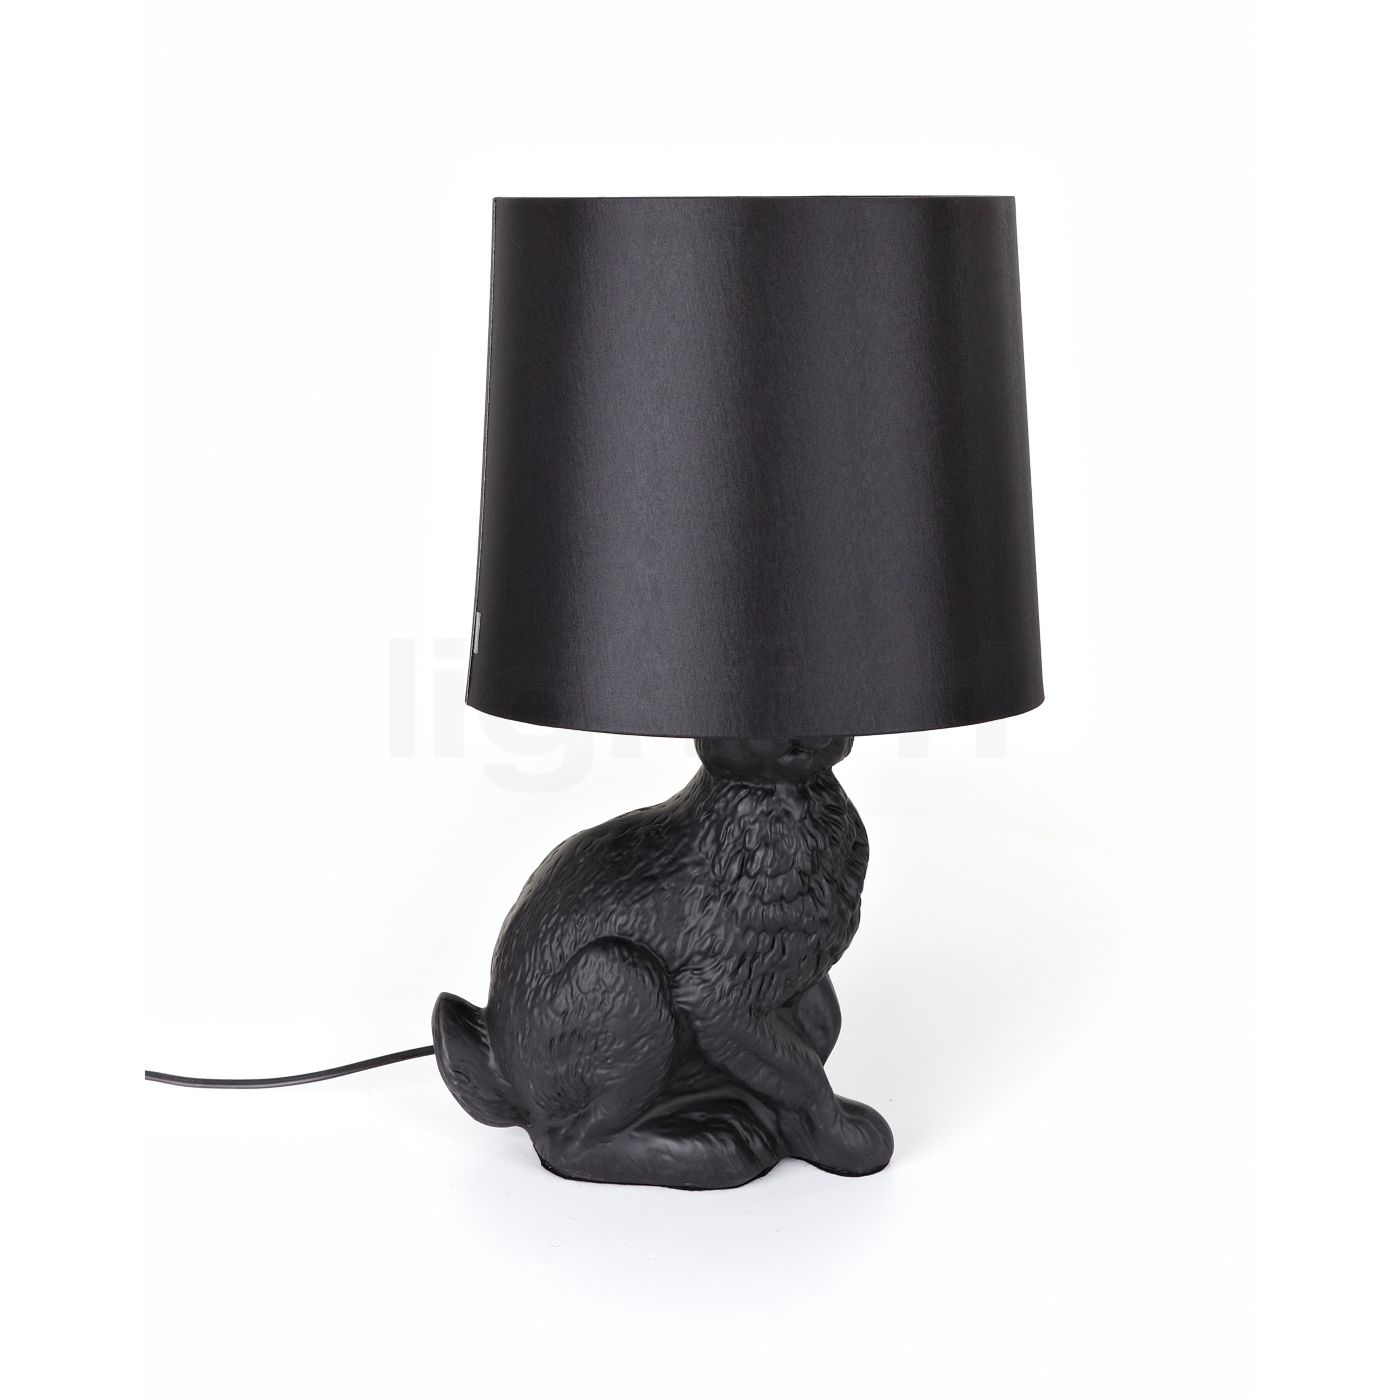 Moooi rabbit lamp table lamp buy at light11 geotapseo Gallery